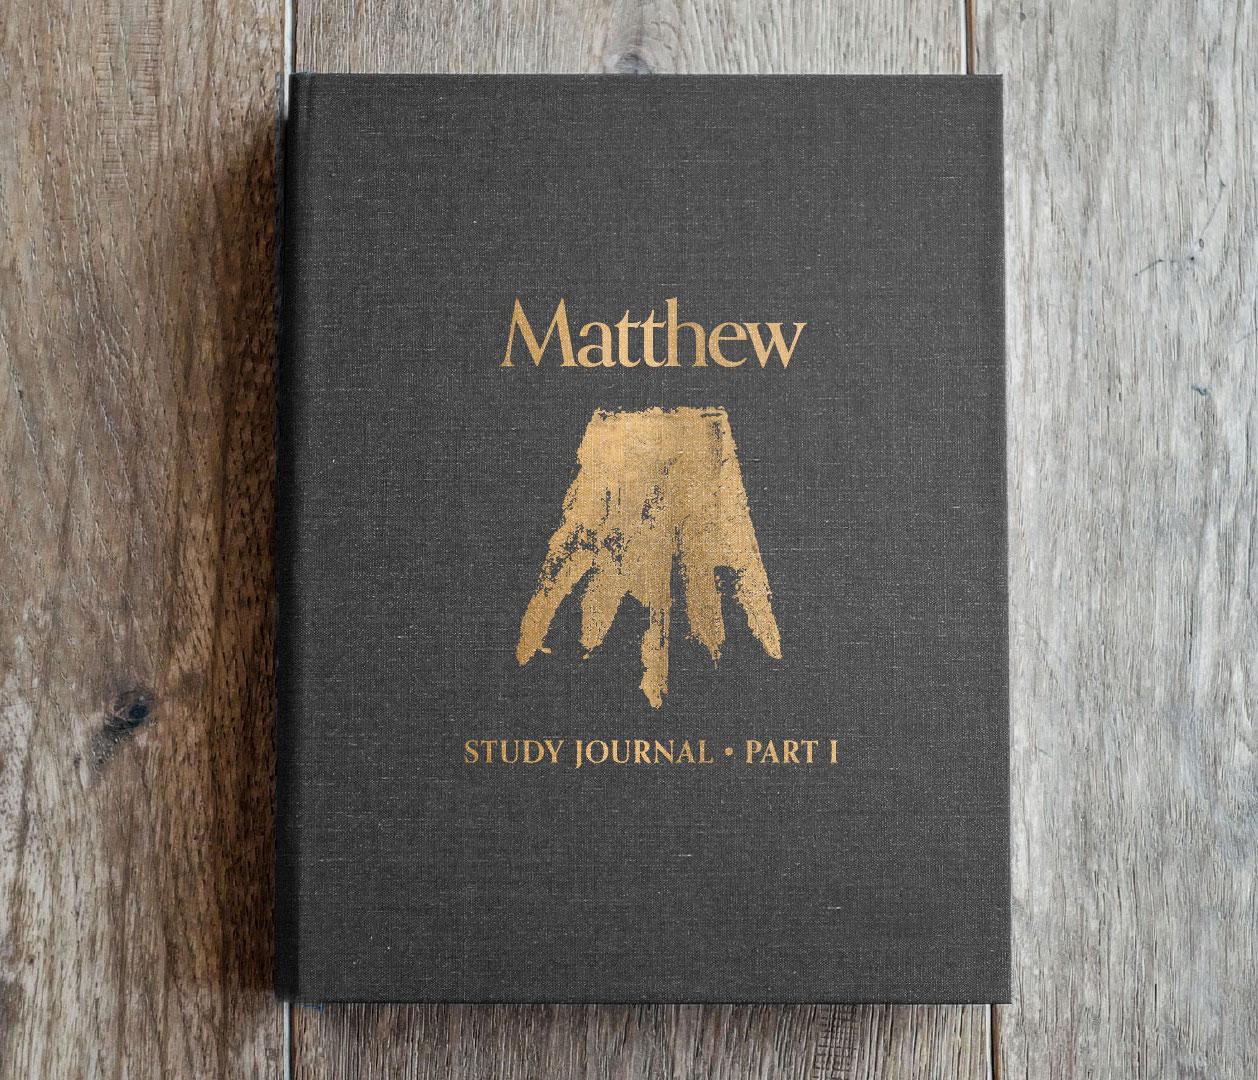 Matthew Study Journals